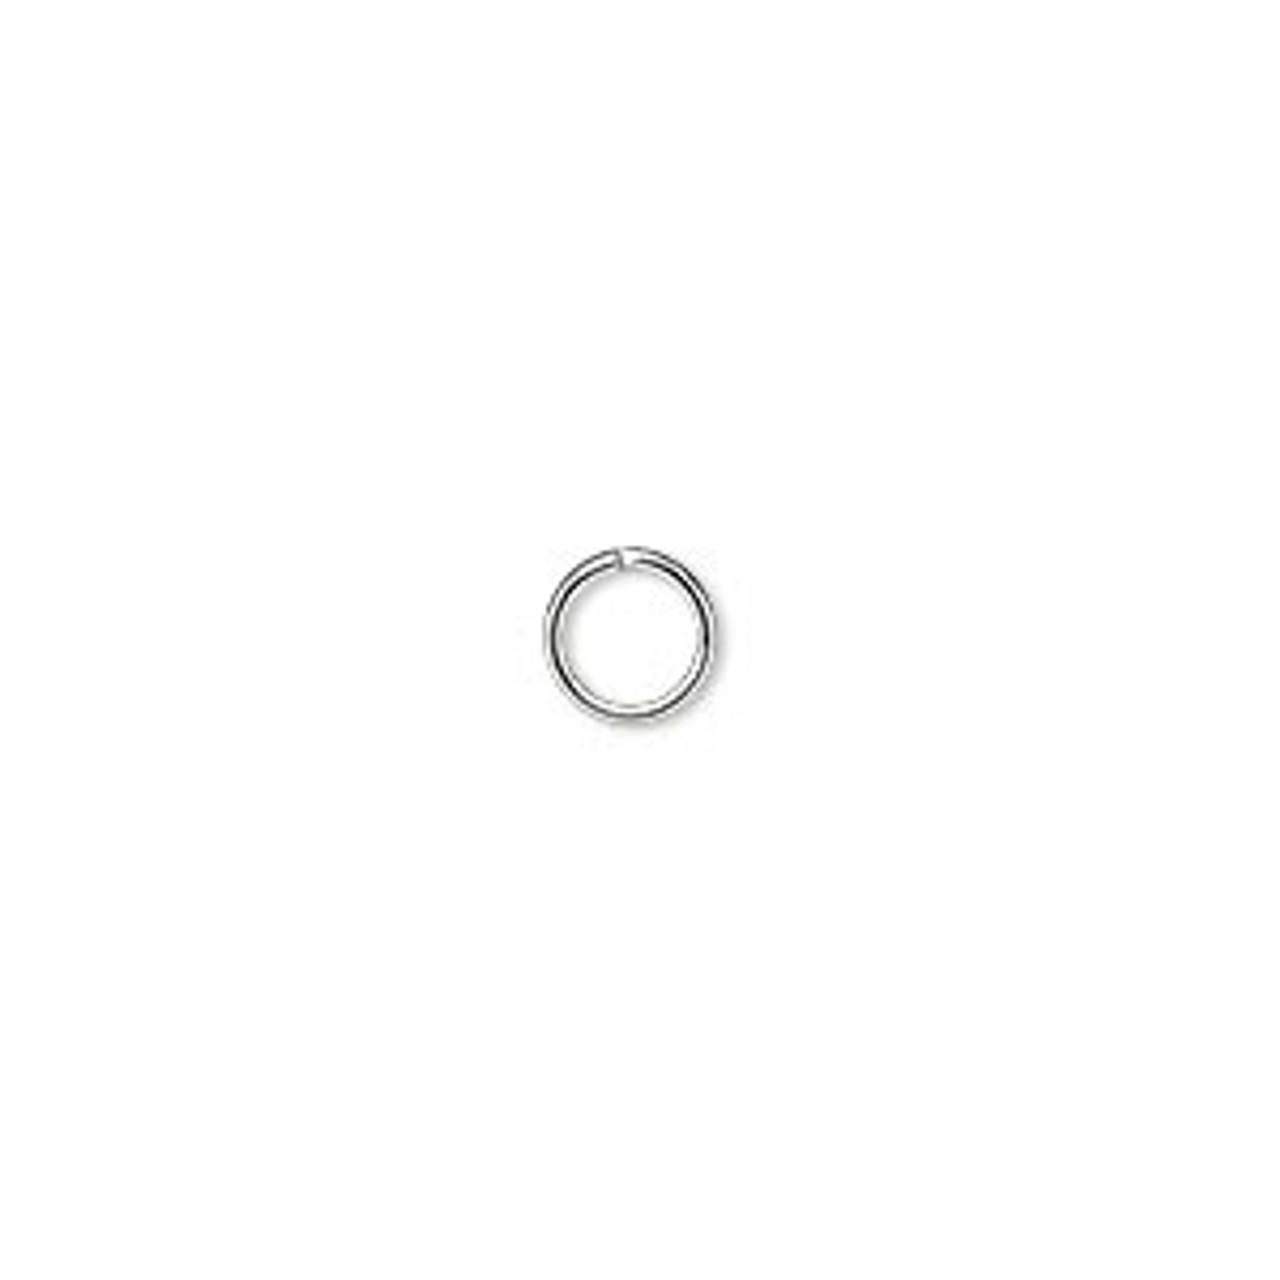 6mm 20 Gauge Silver Plated Jump Rings (100 Pack)